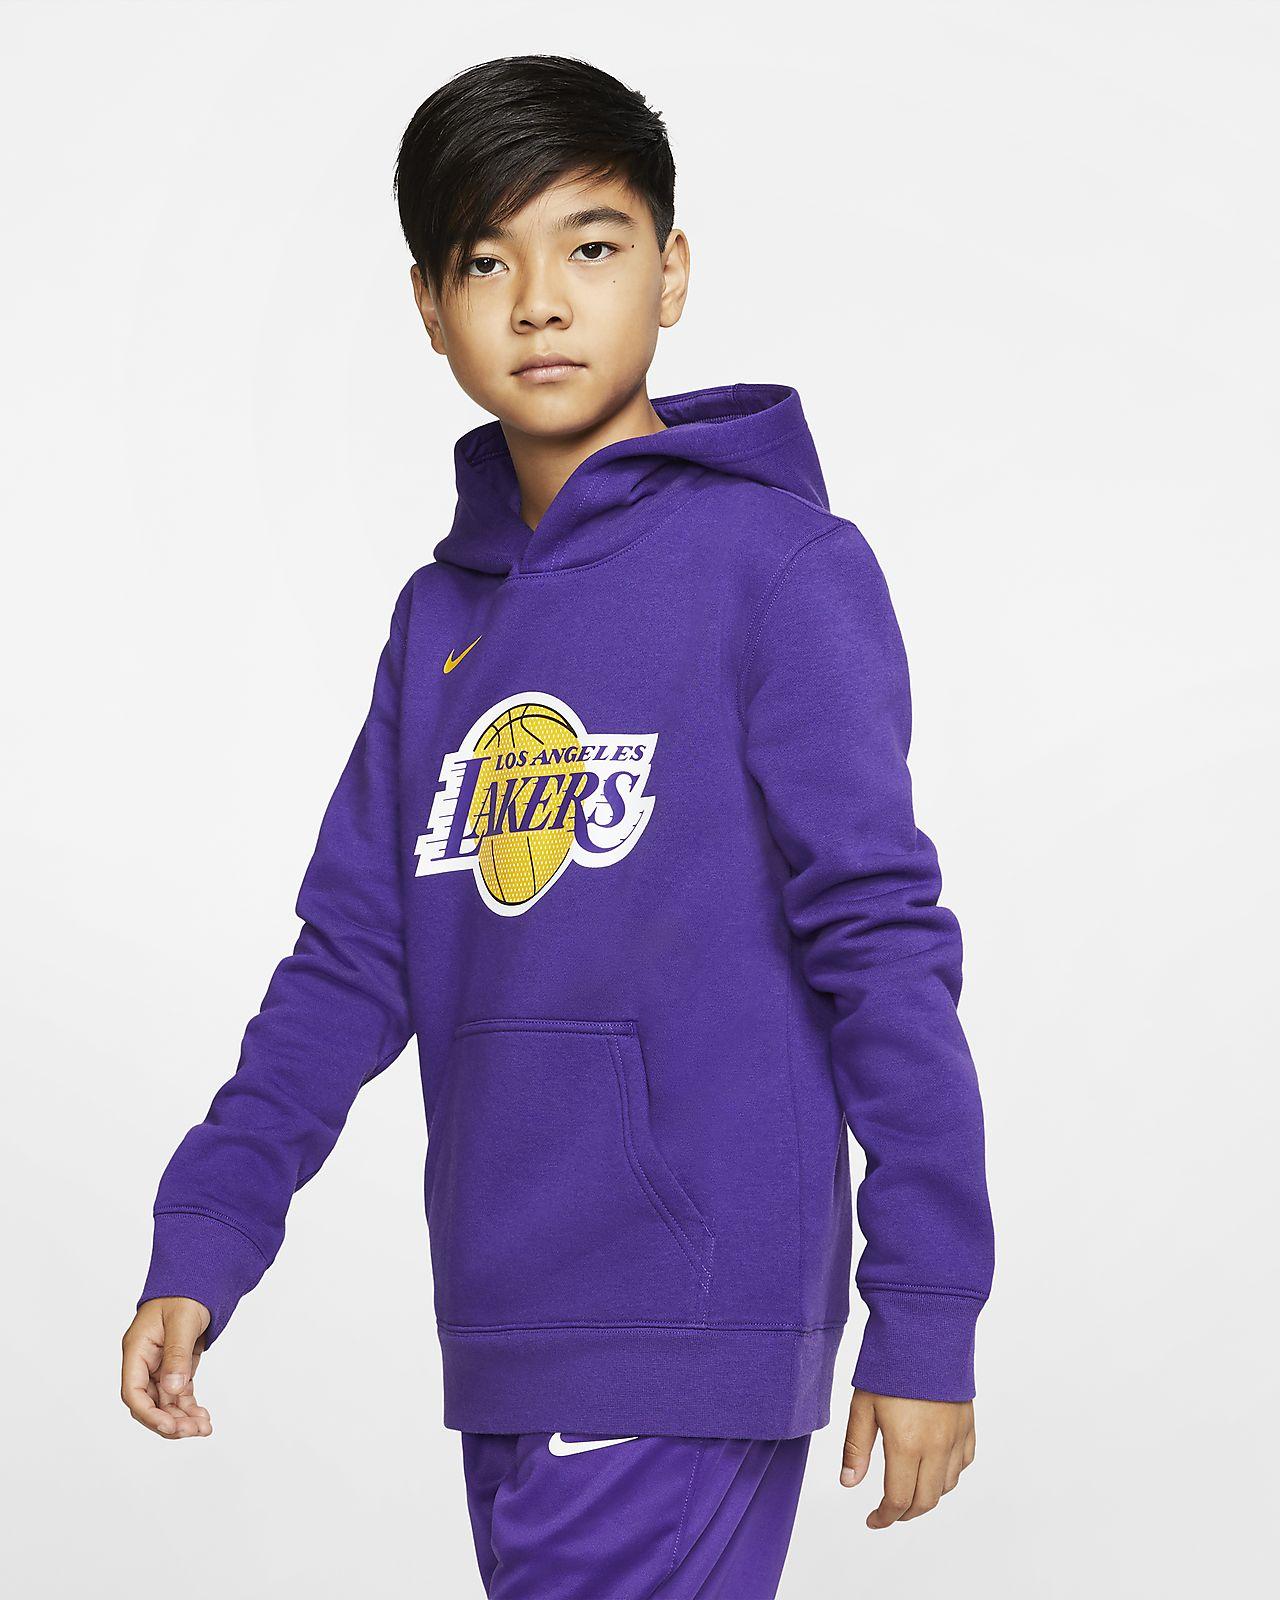 Los Angeles Lakers Logo Nike NBA-s belebújós, kapucnis pulóver nagyobb gyerekeknek